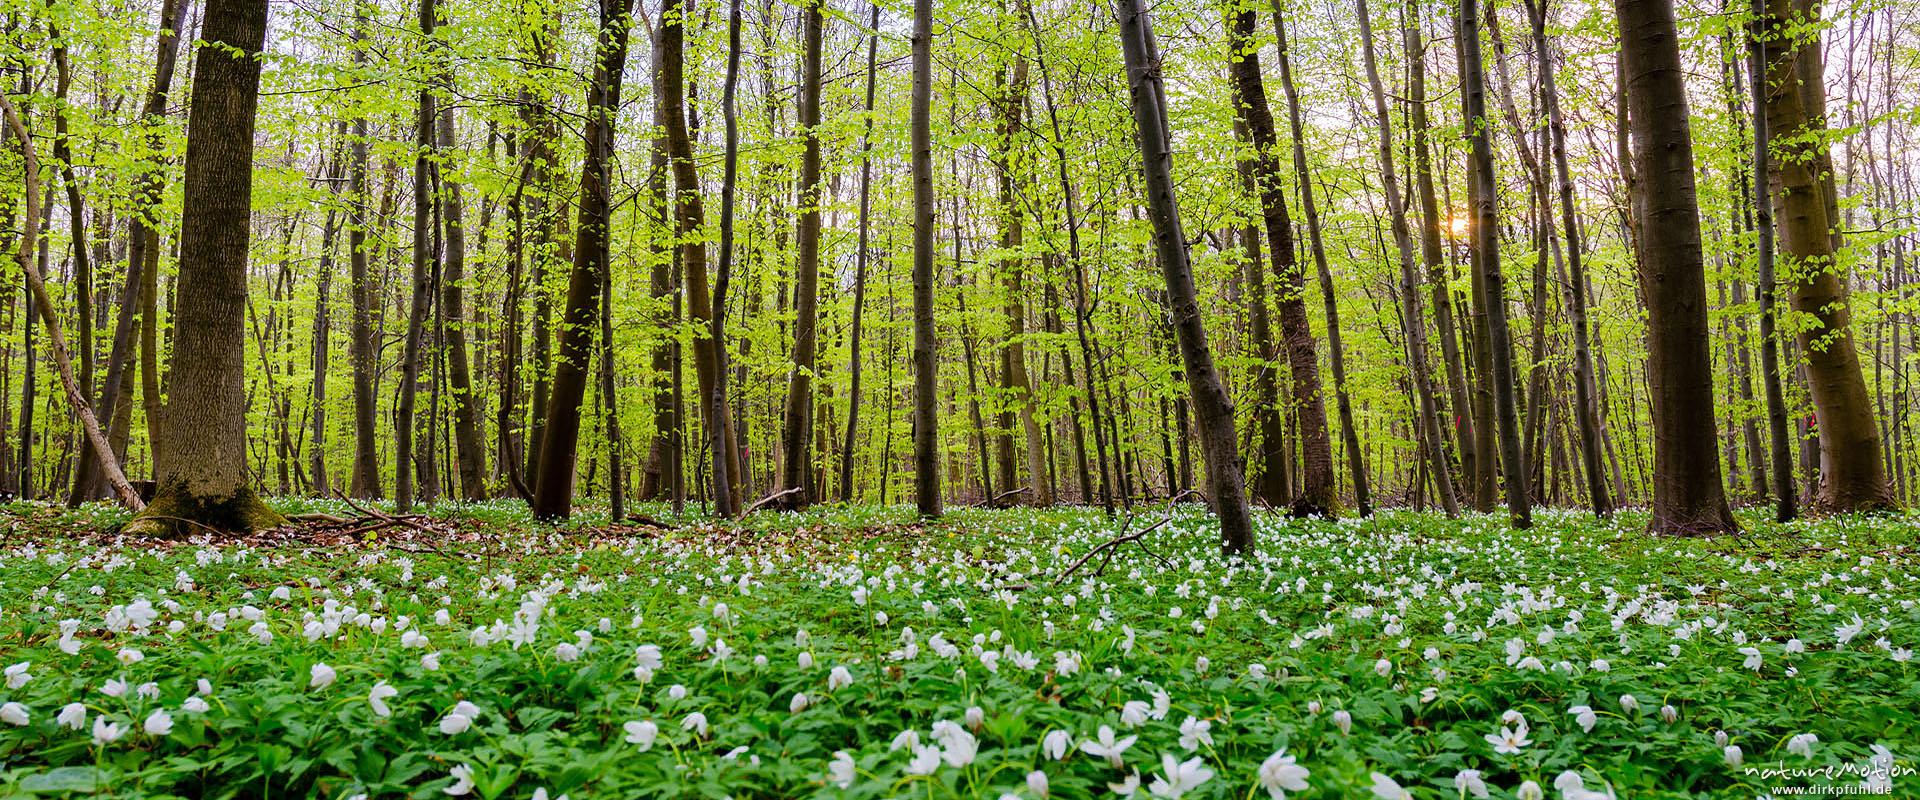 Buschwindröschen blühen im Frühlingswald, Göttinger Wald